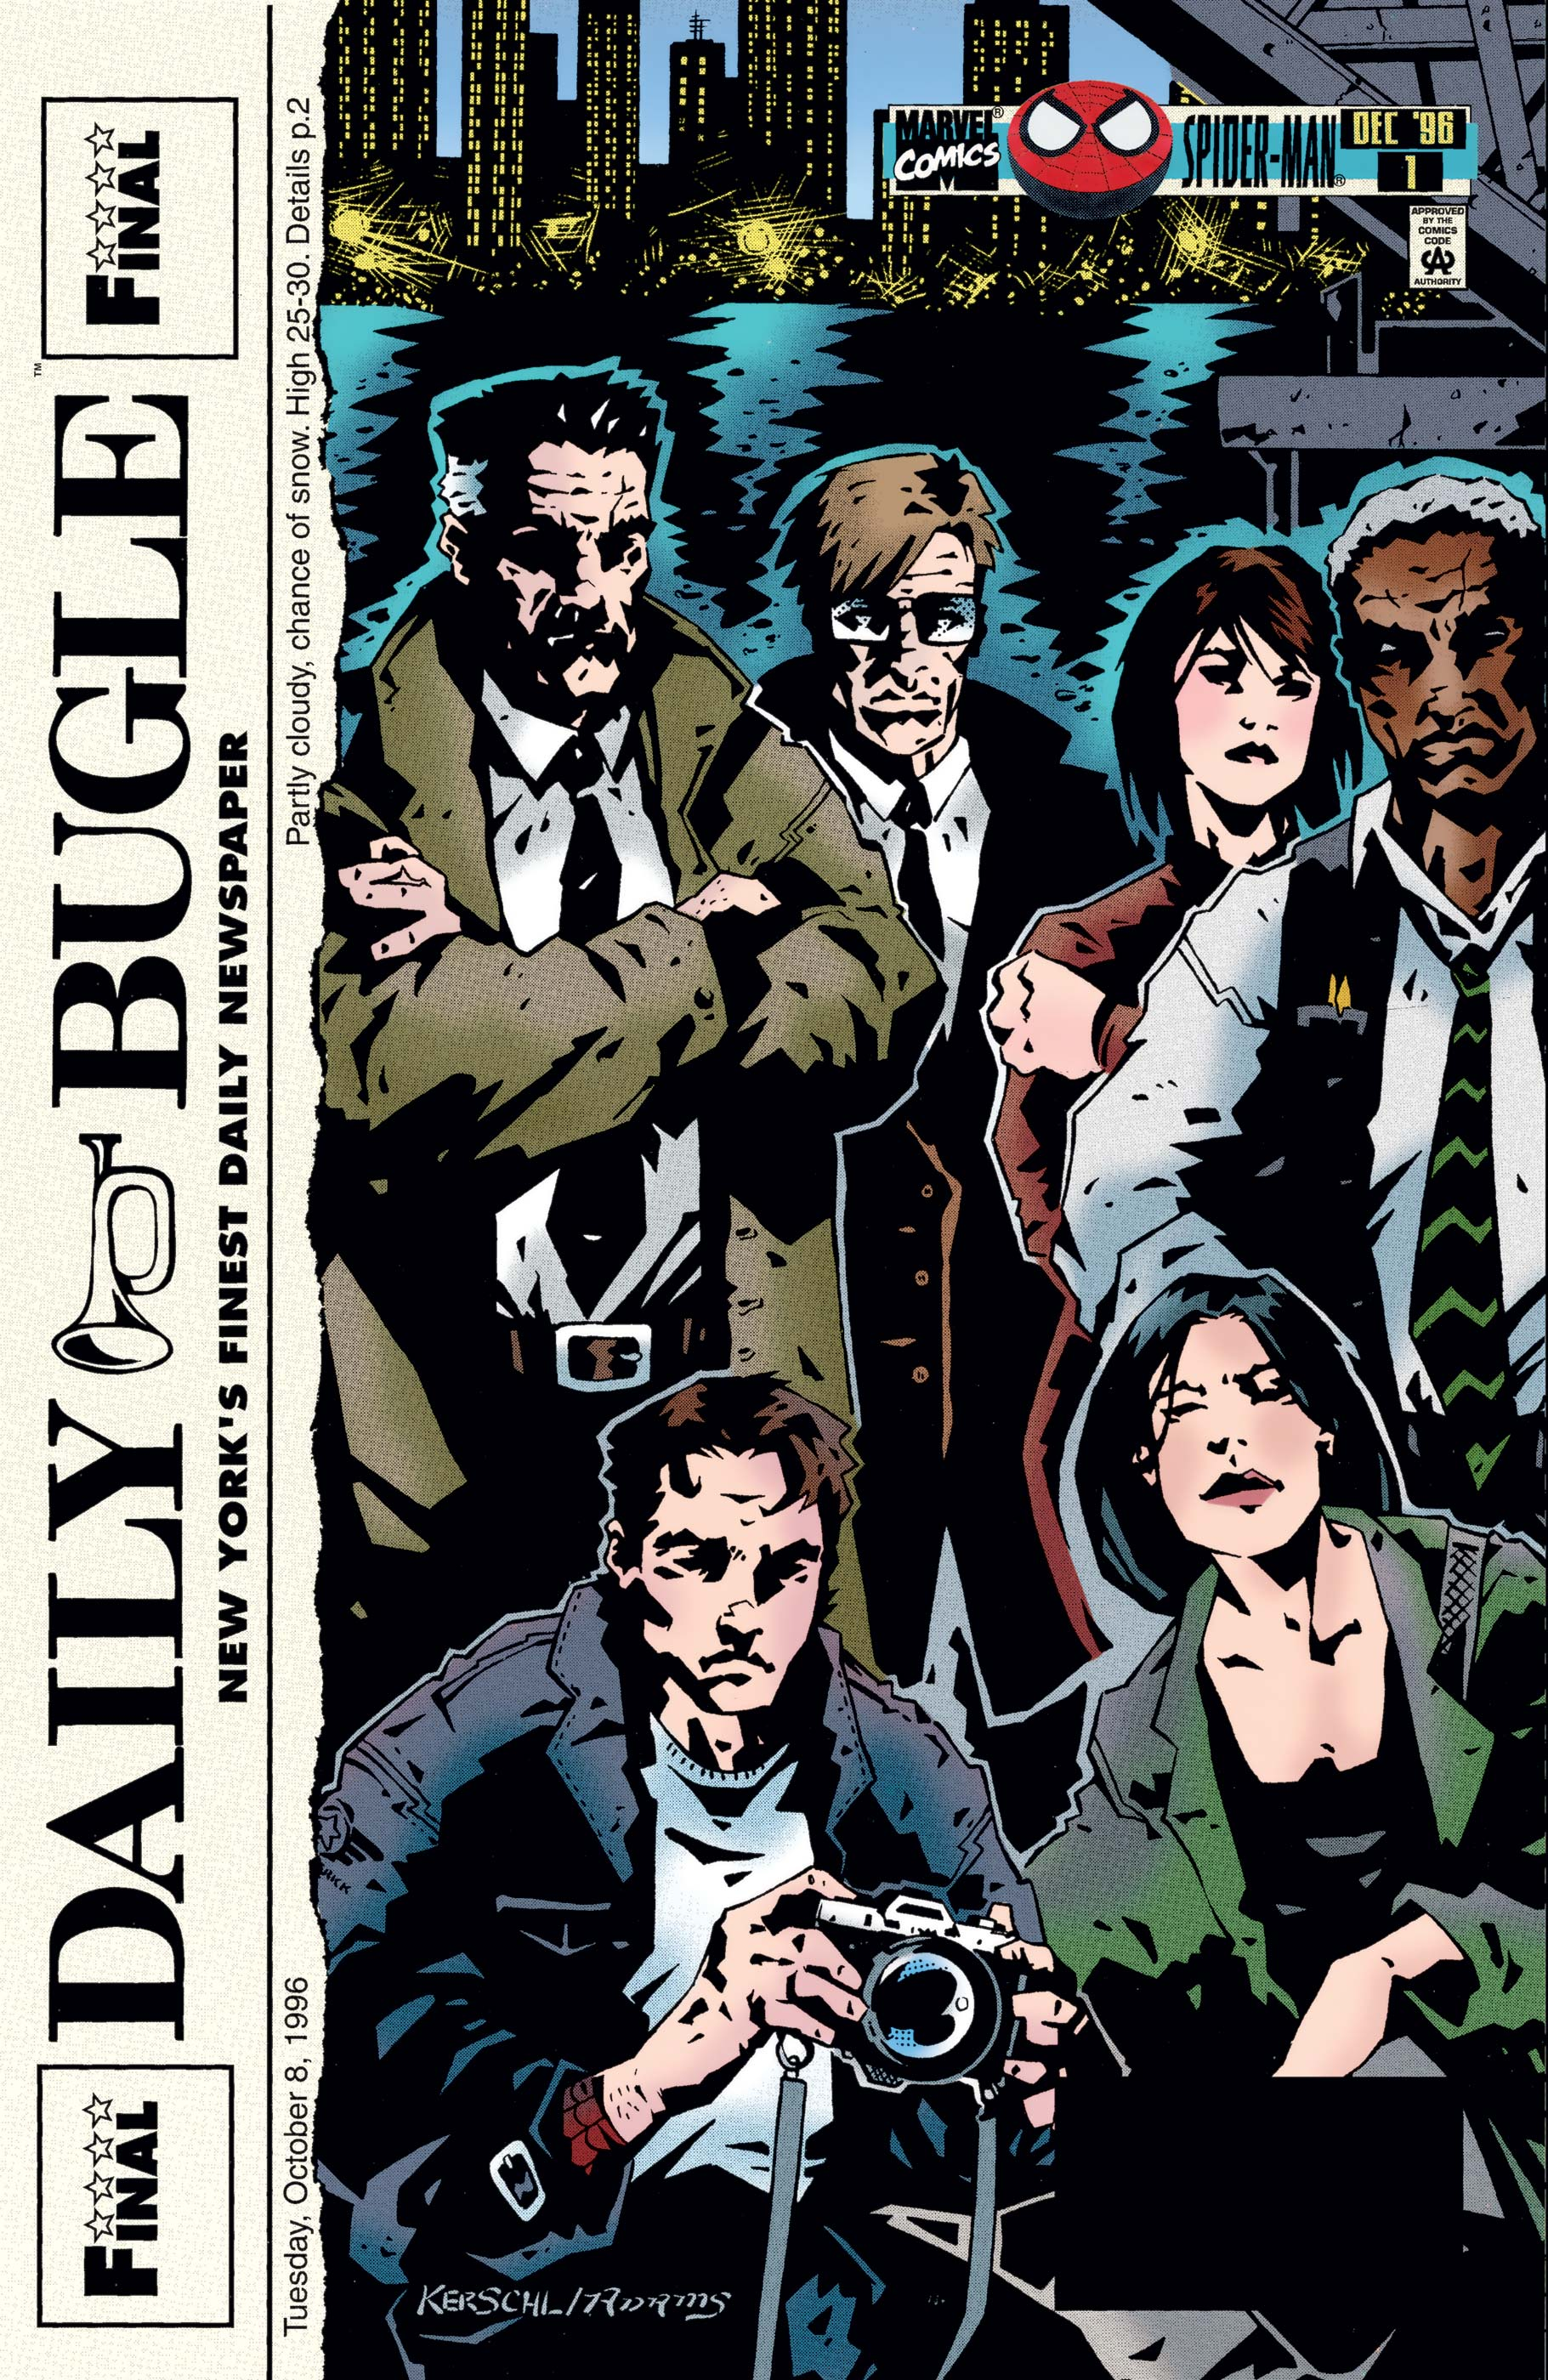 Daily Bugle (1996) #1